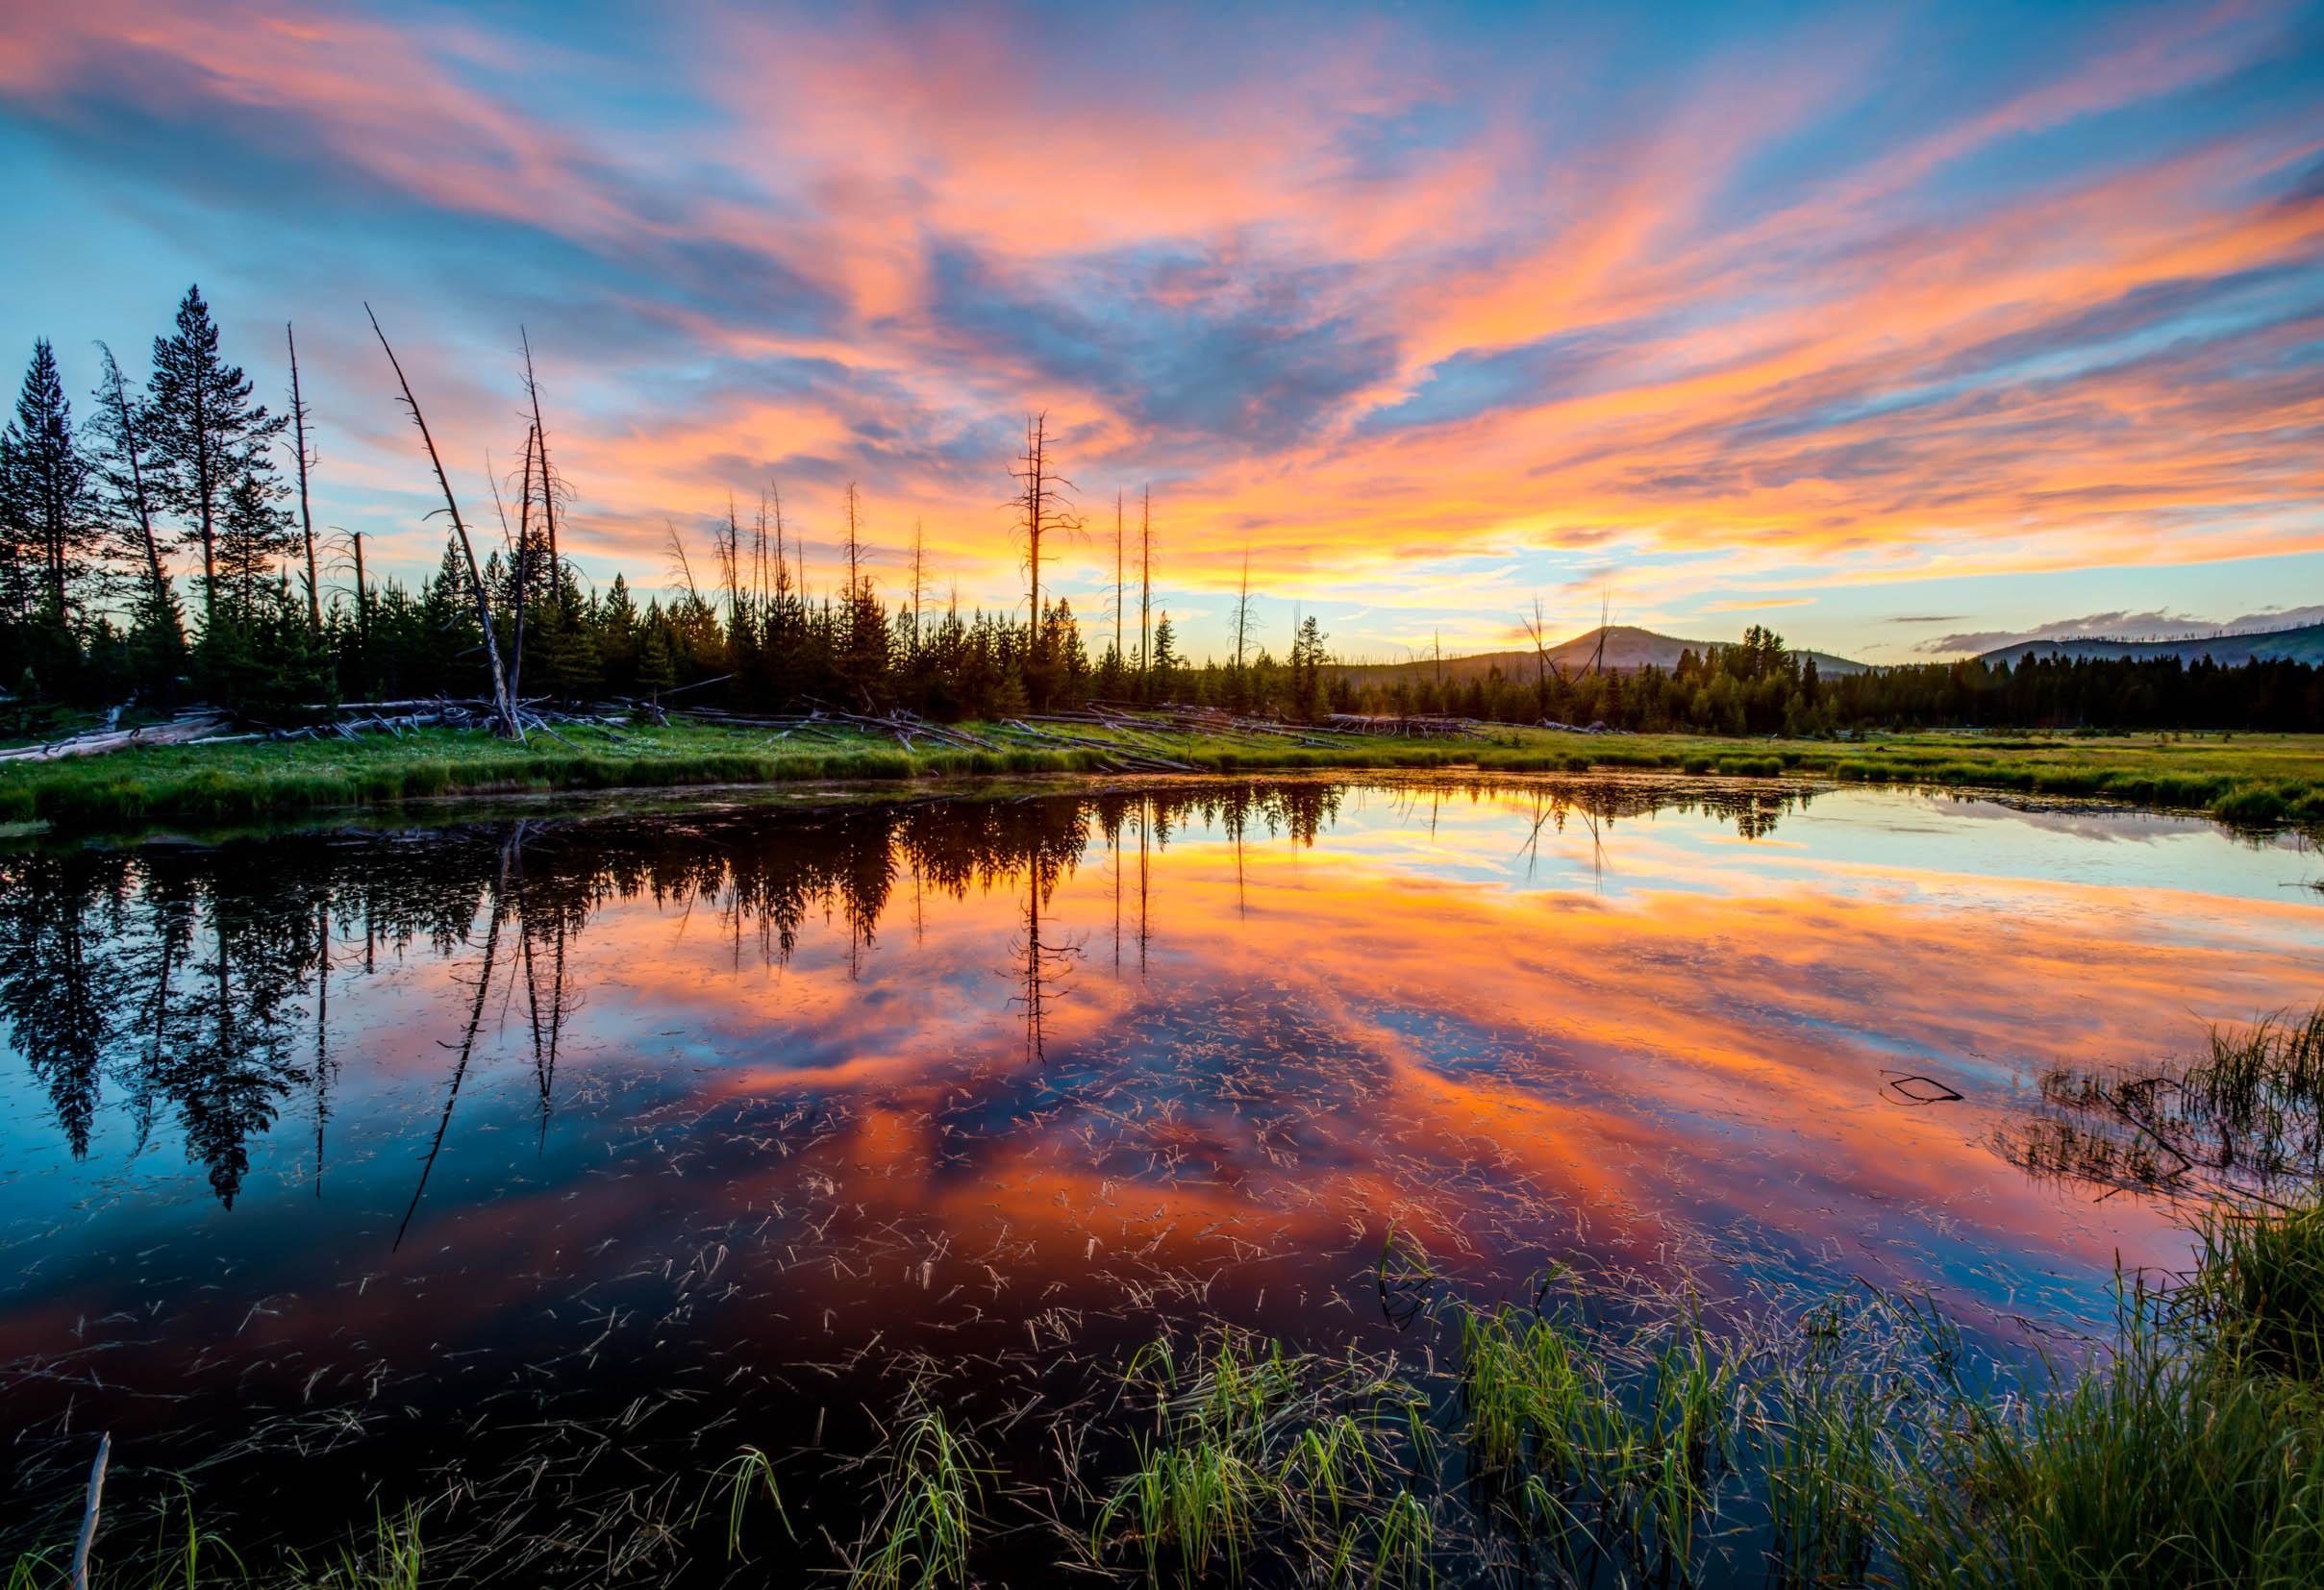 Yellowstone near Canyon camping area